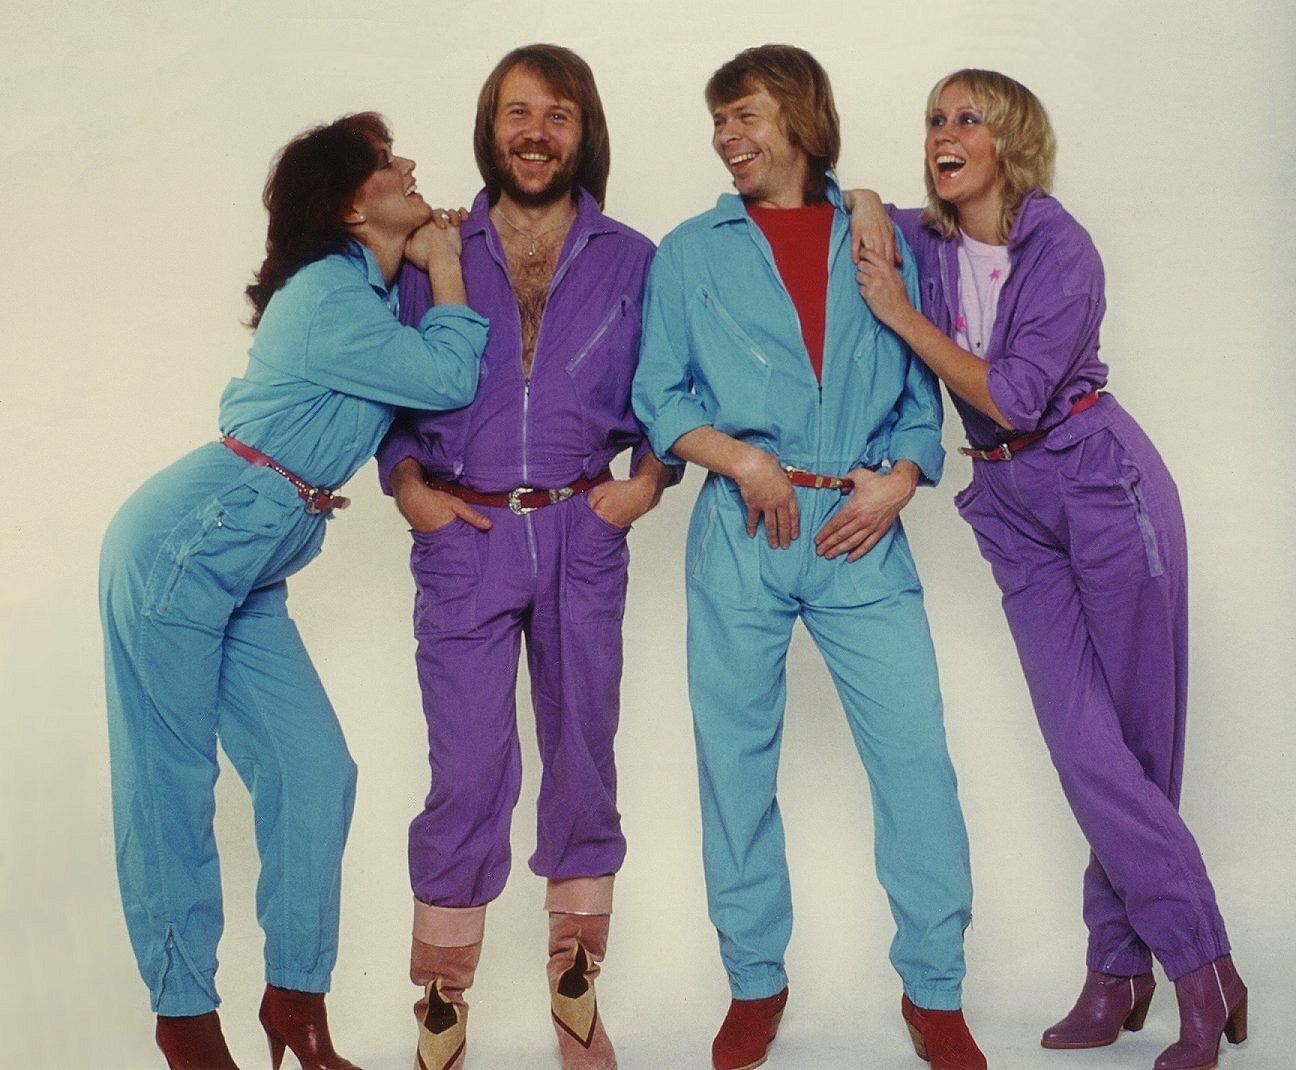 ABBA Music Pill celebra el 45º aniversario de 'Waterloo'